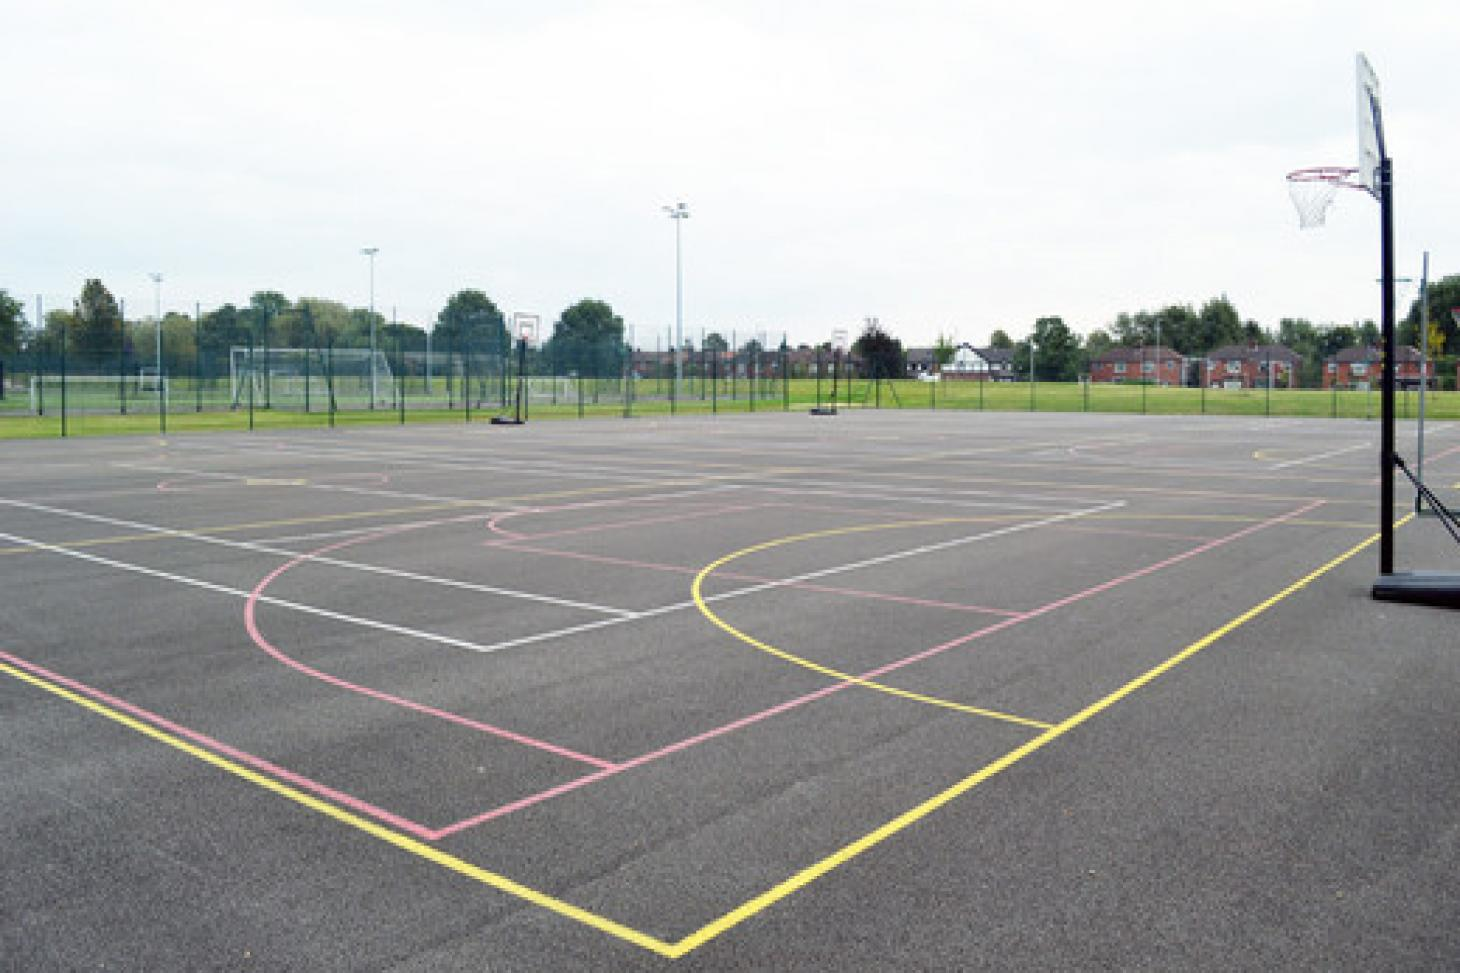 Droylsden Academy Outdoor | Concrete netball court